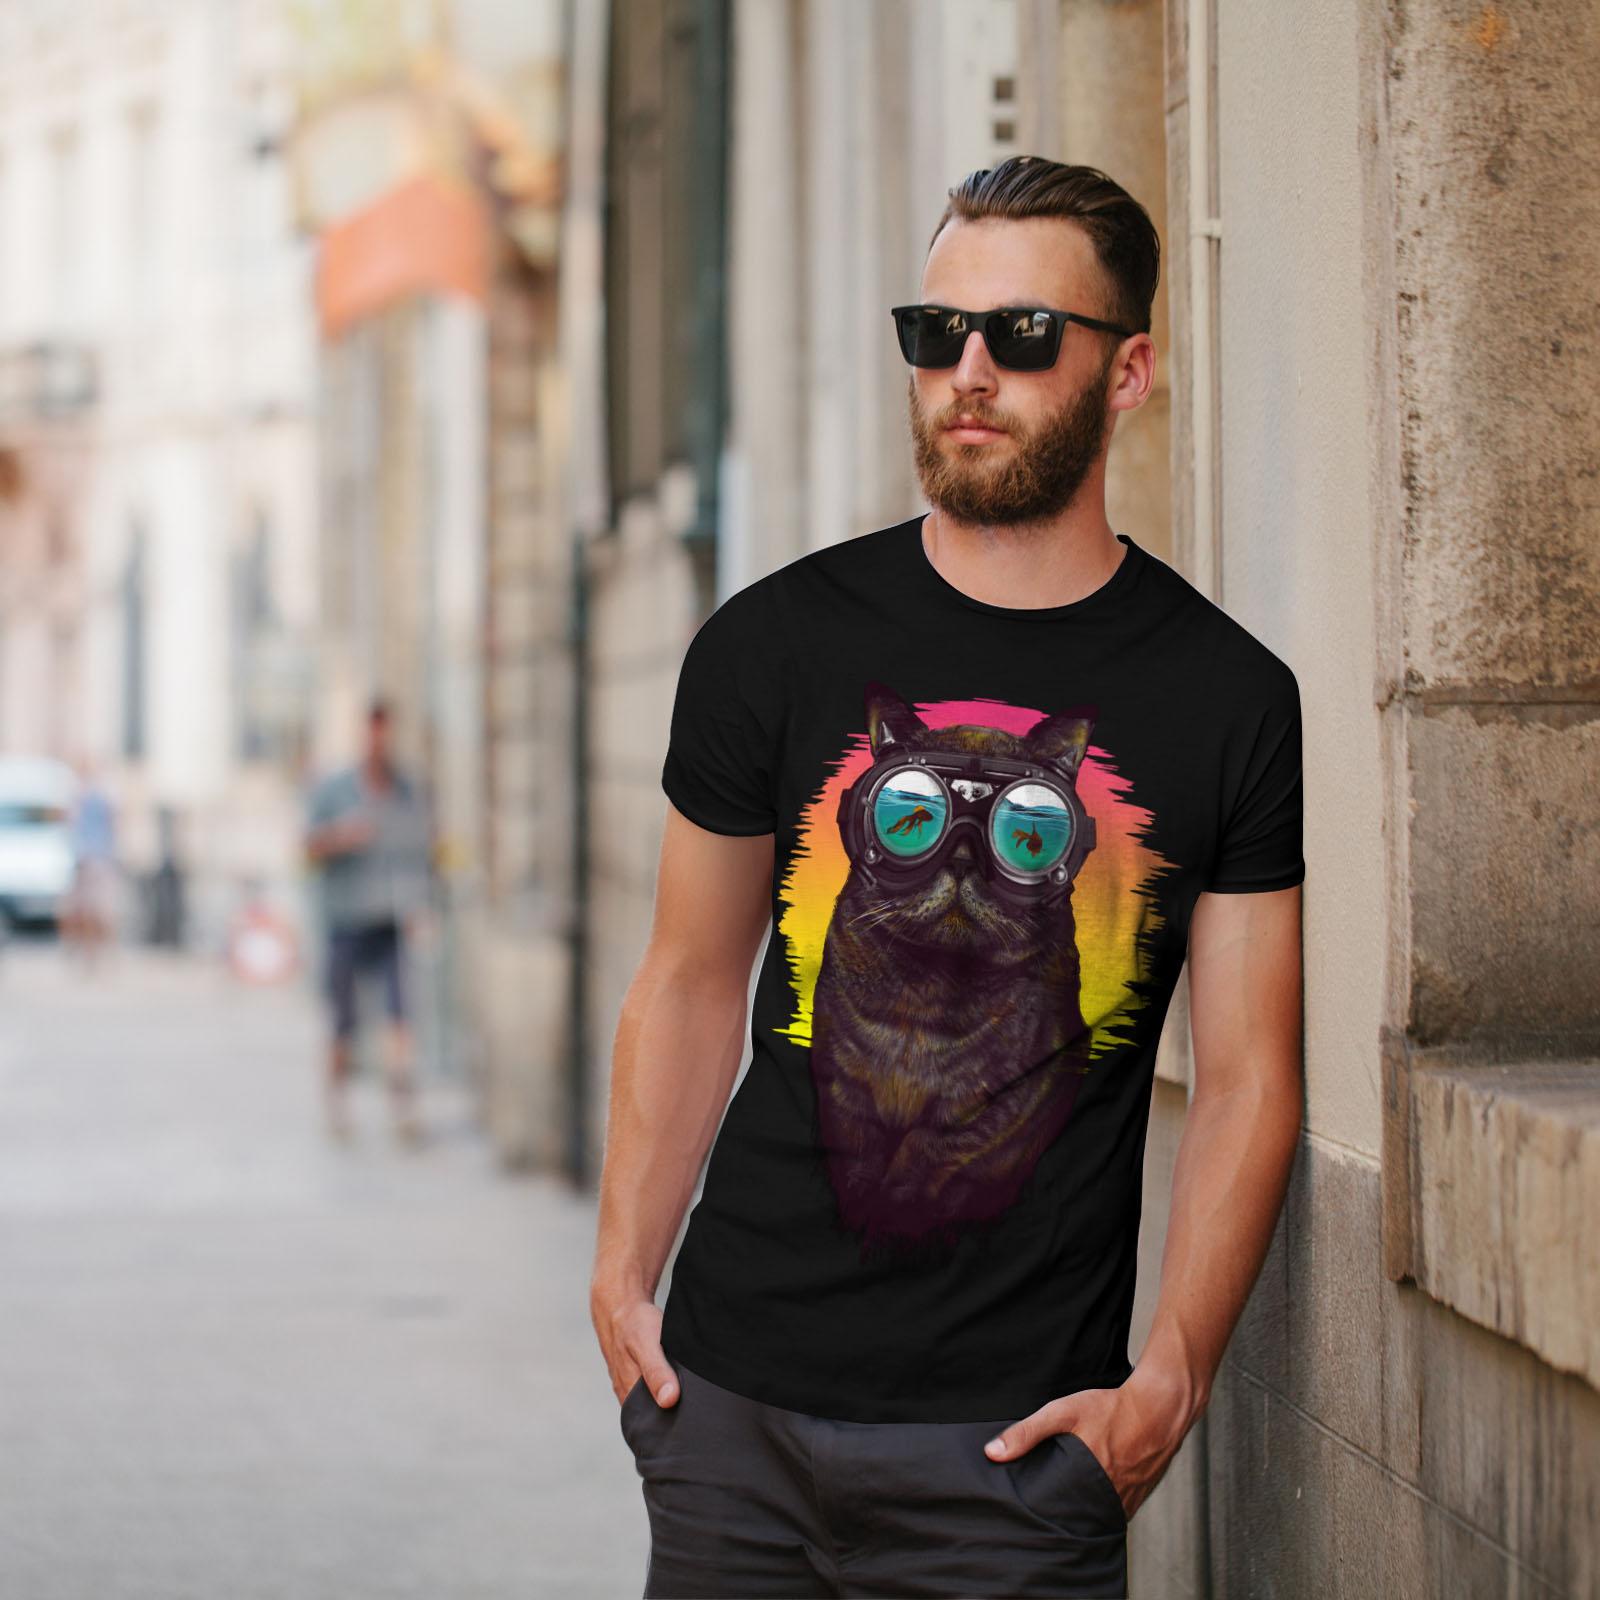 Wellcoda-Hippie-Glasses-Cool-Cat-Mens-T-shirt-Fish-Graphic-Design-Printed-Tee thumbnail 5